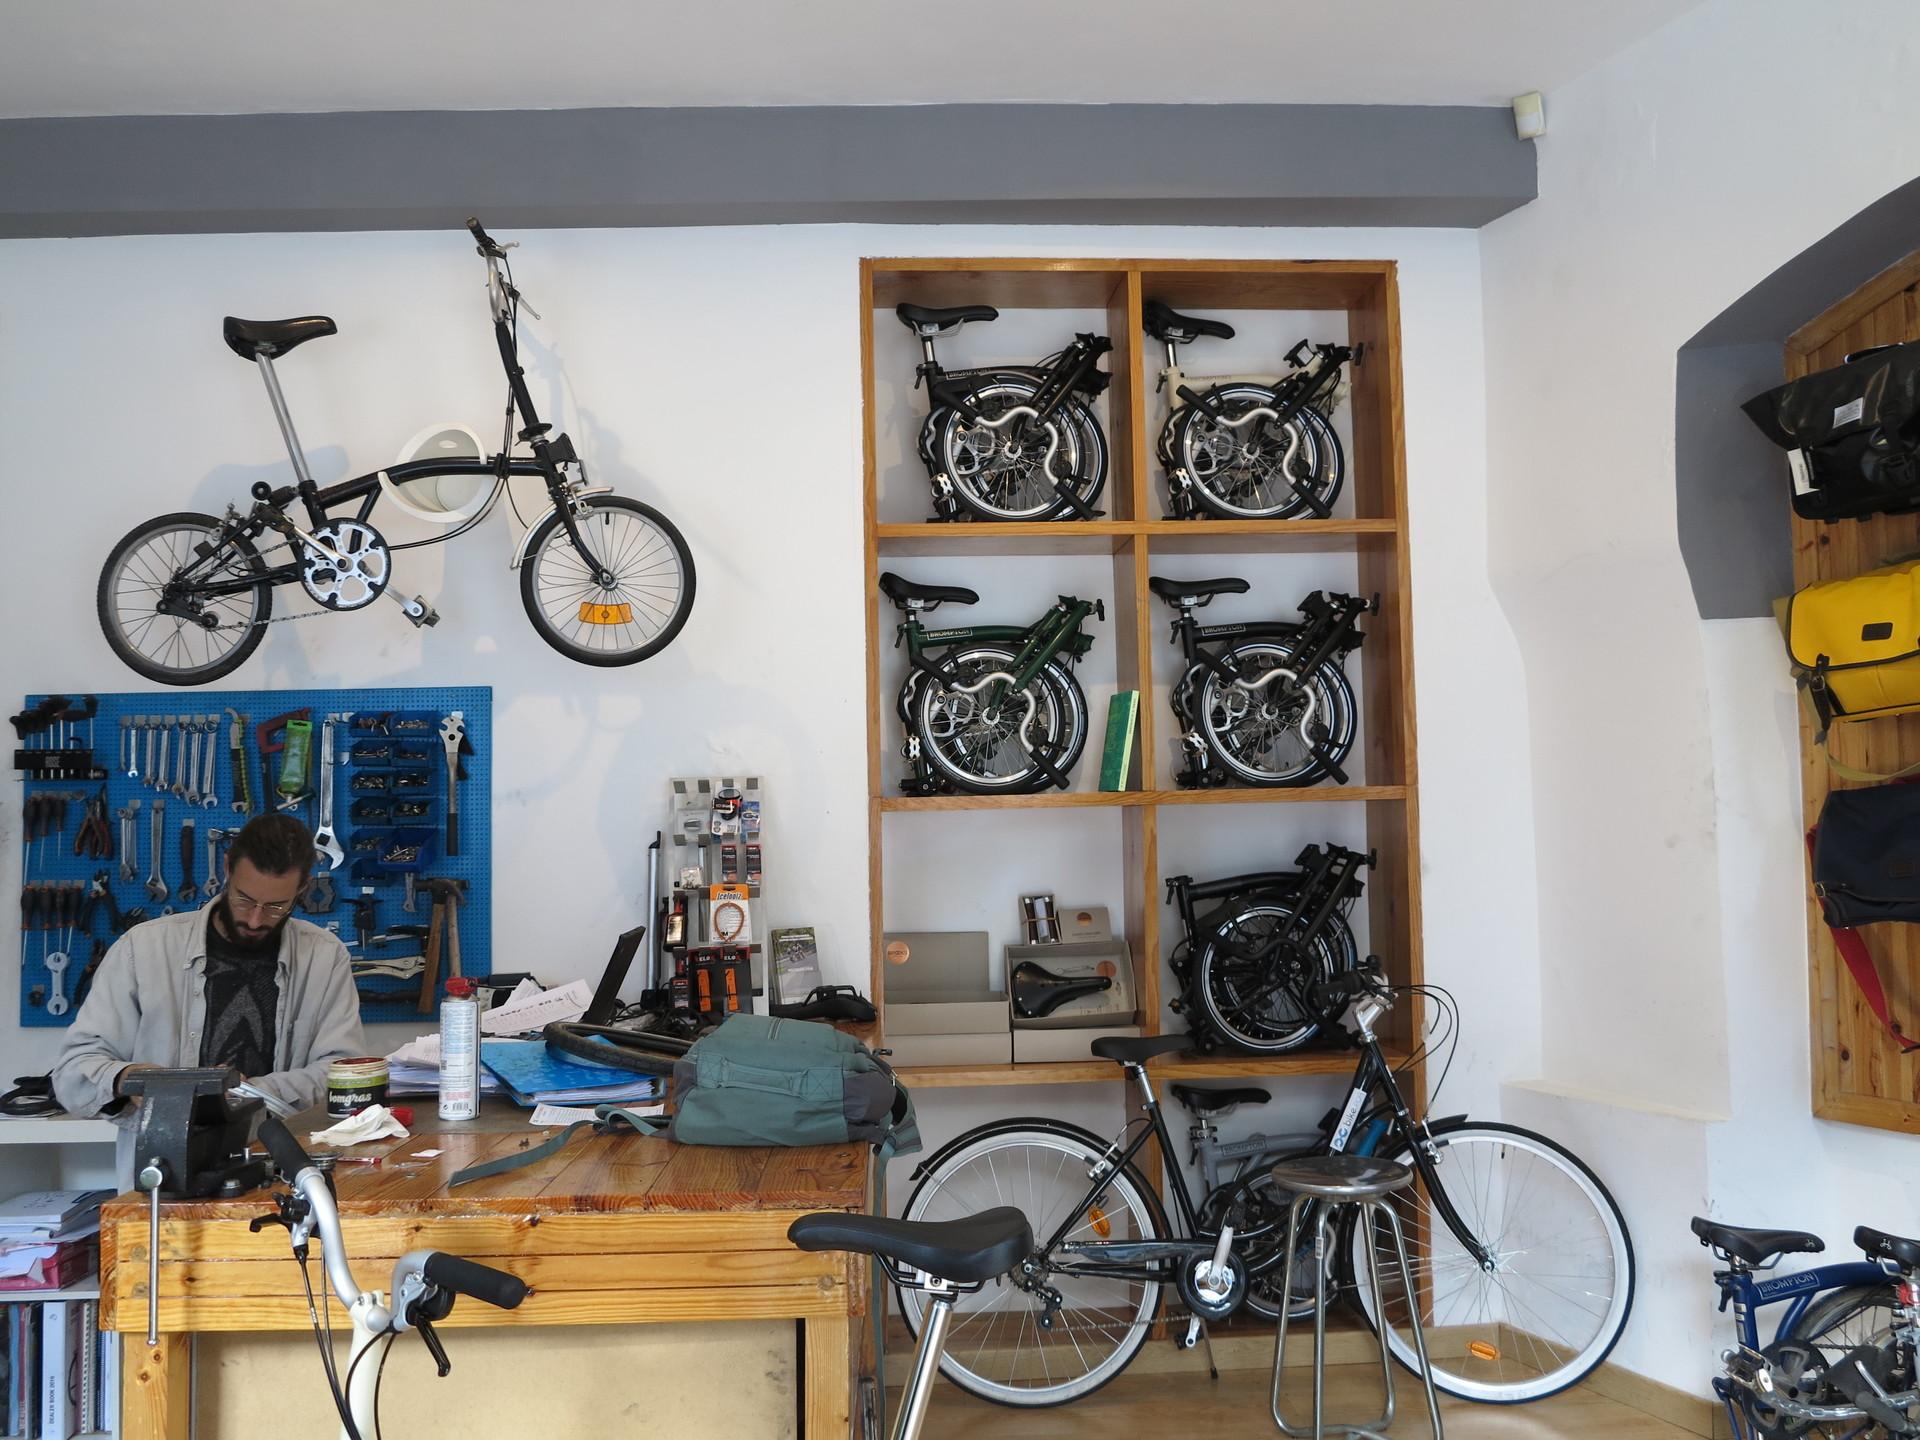 acquiring-bike-intendente-5bdb436ec1c84b